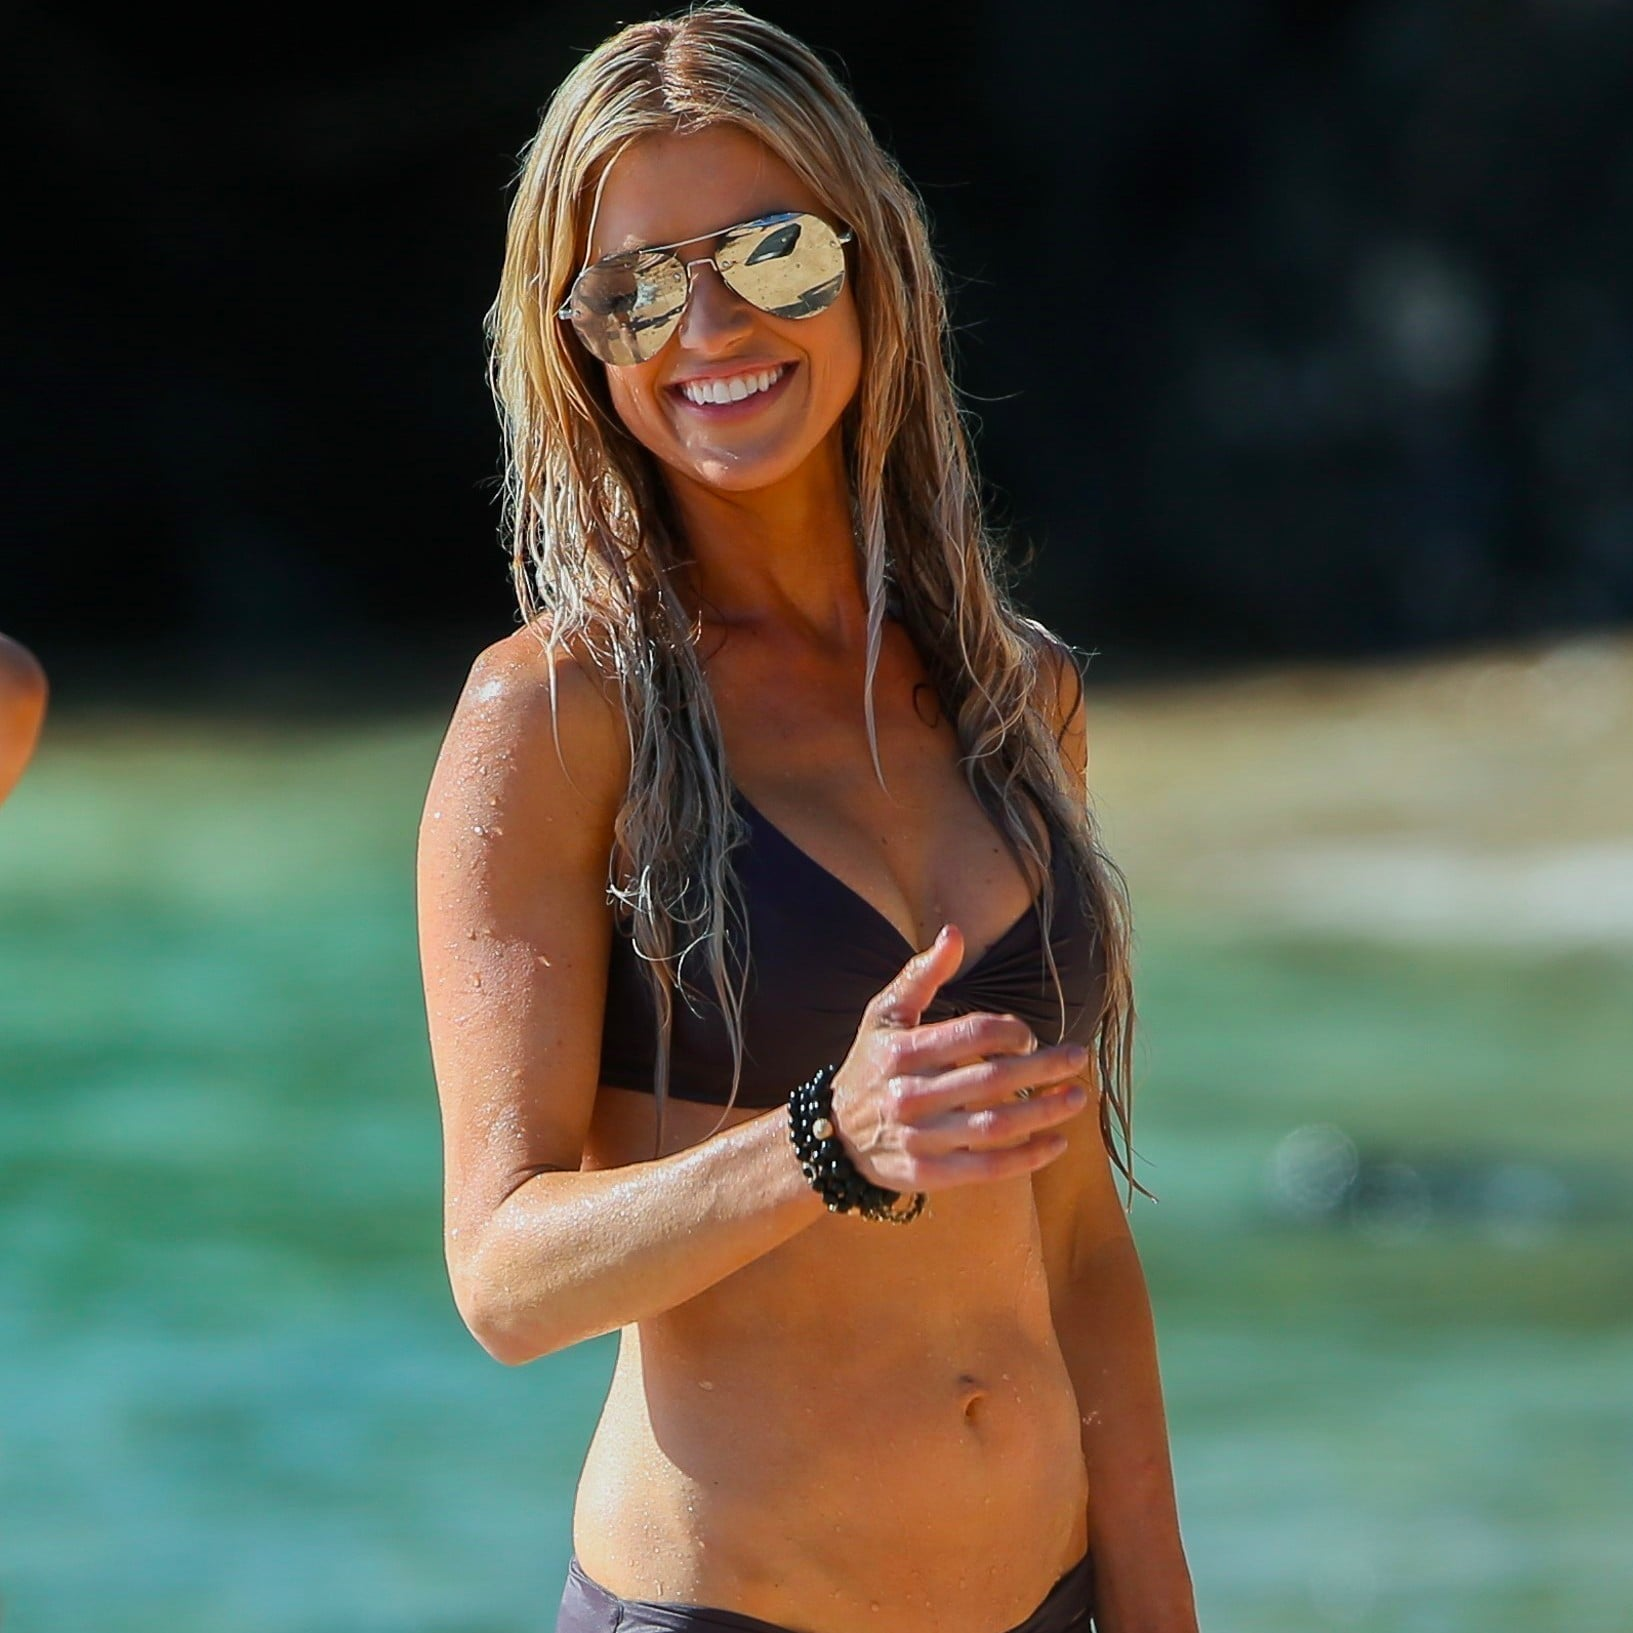 Christina El Moussa Bikini Pictures Popsugar Celebrity